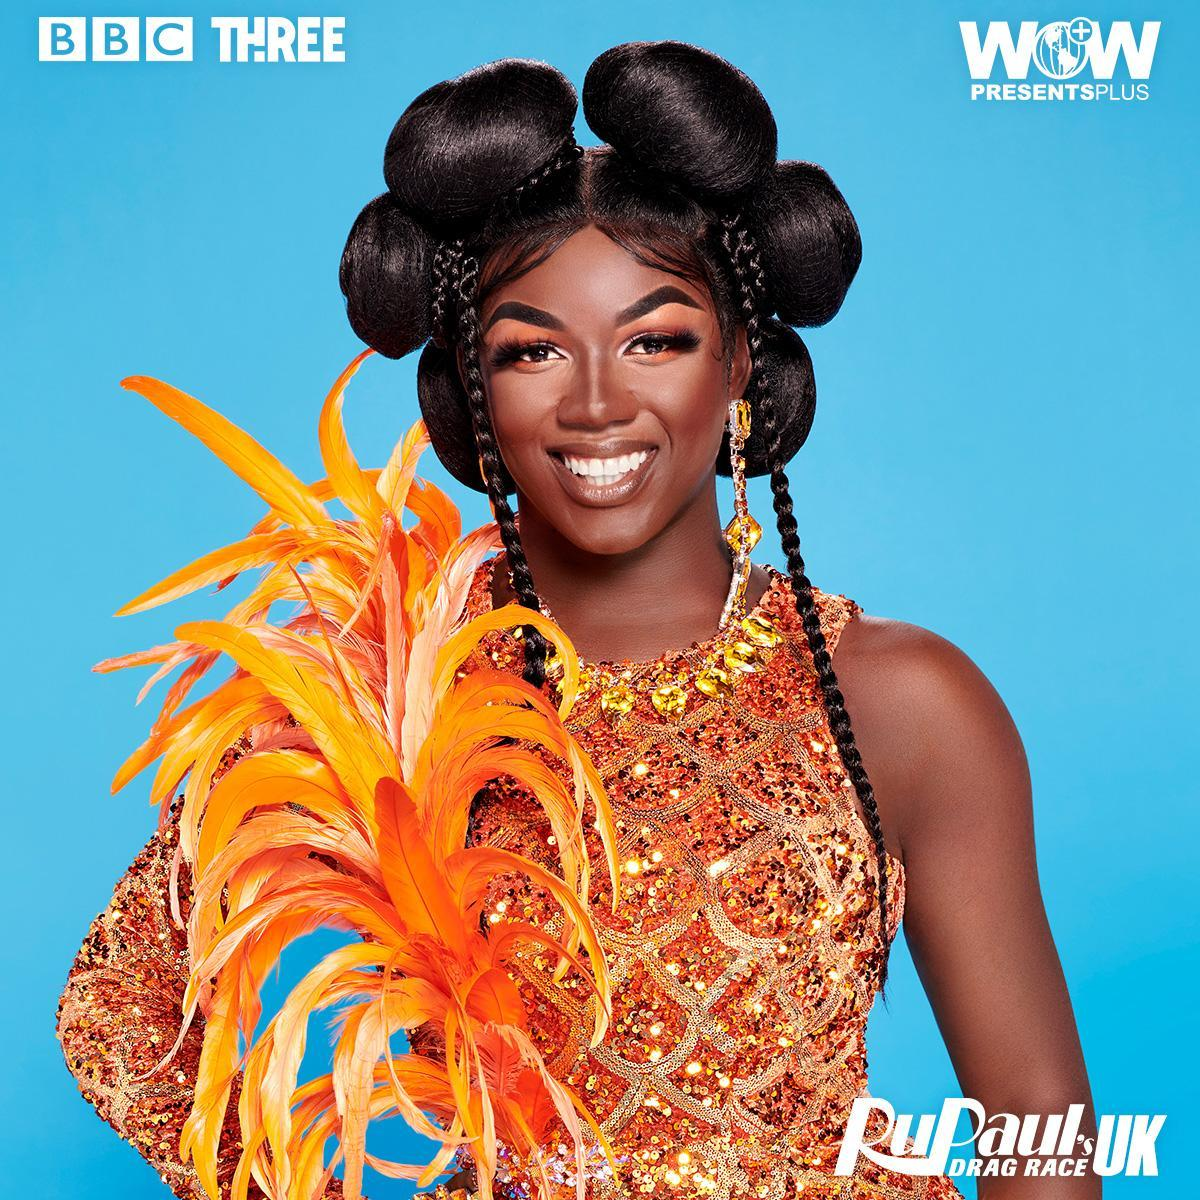 Meet the Queens of RuPaul's Drag Race UK Season 3! 18